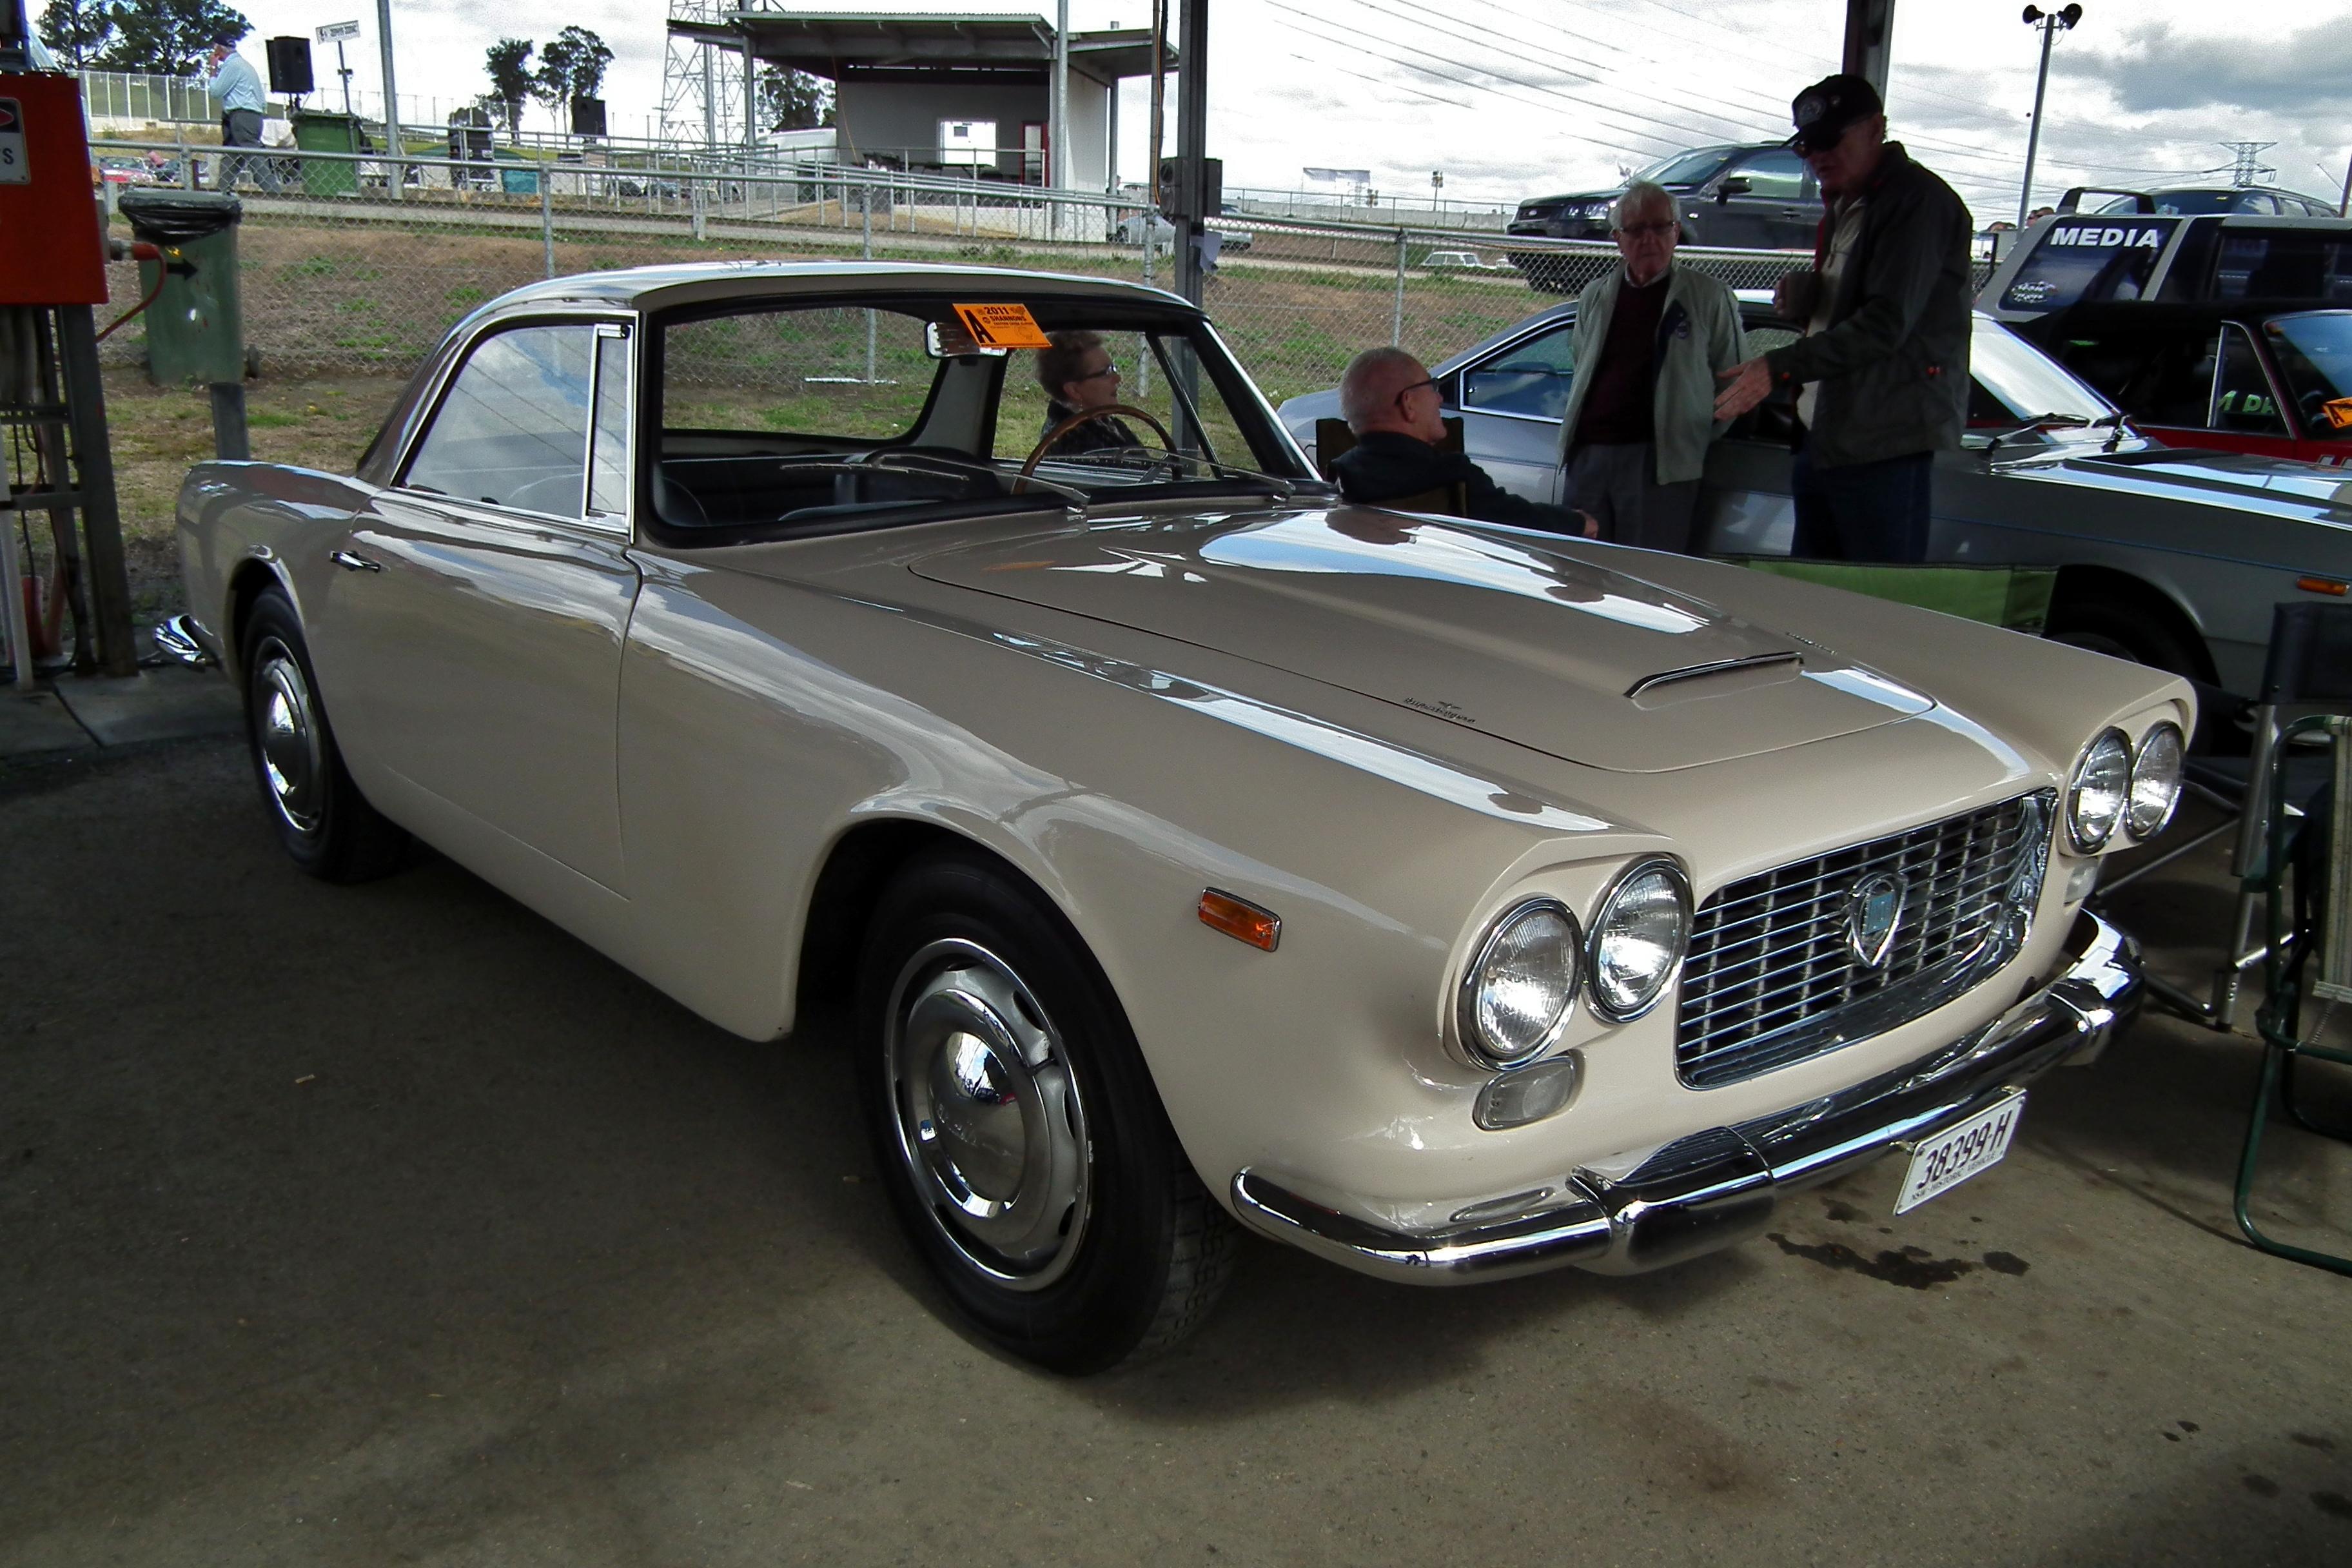 https://upload.wikimedia.org/wikipedia/commons/f/fd/1960_Lancia_Flaminia_GT_coupe_%286106158008%29.jpg